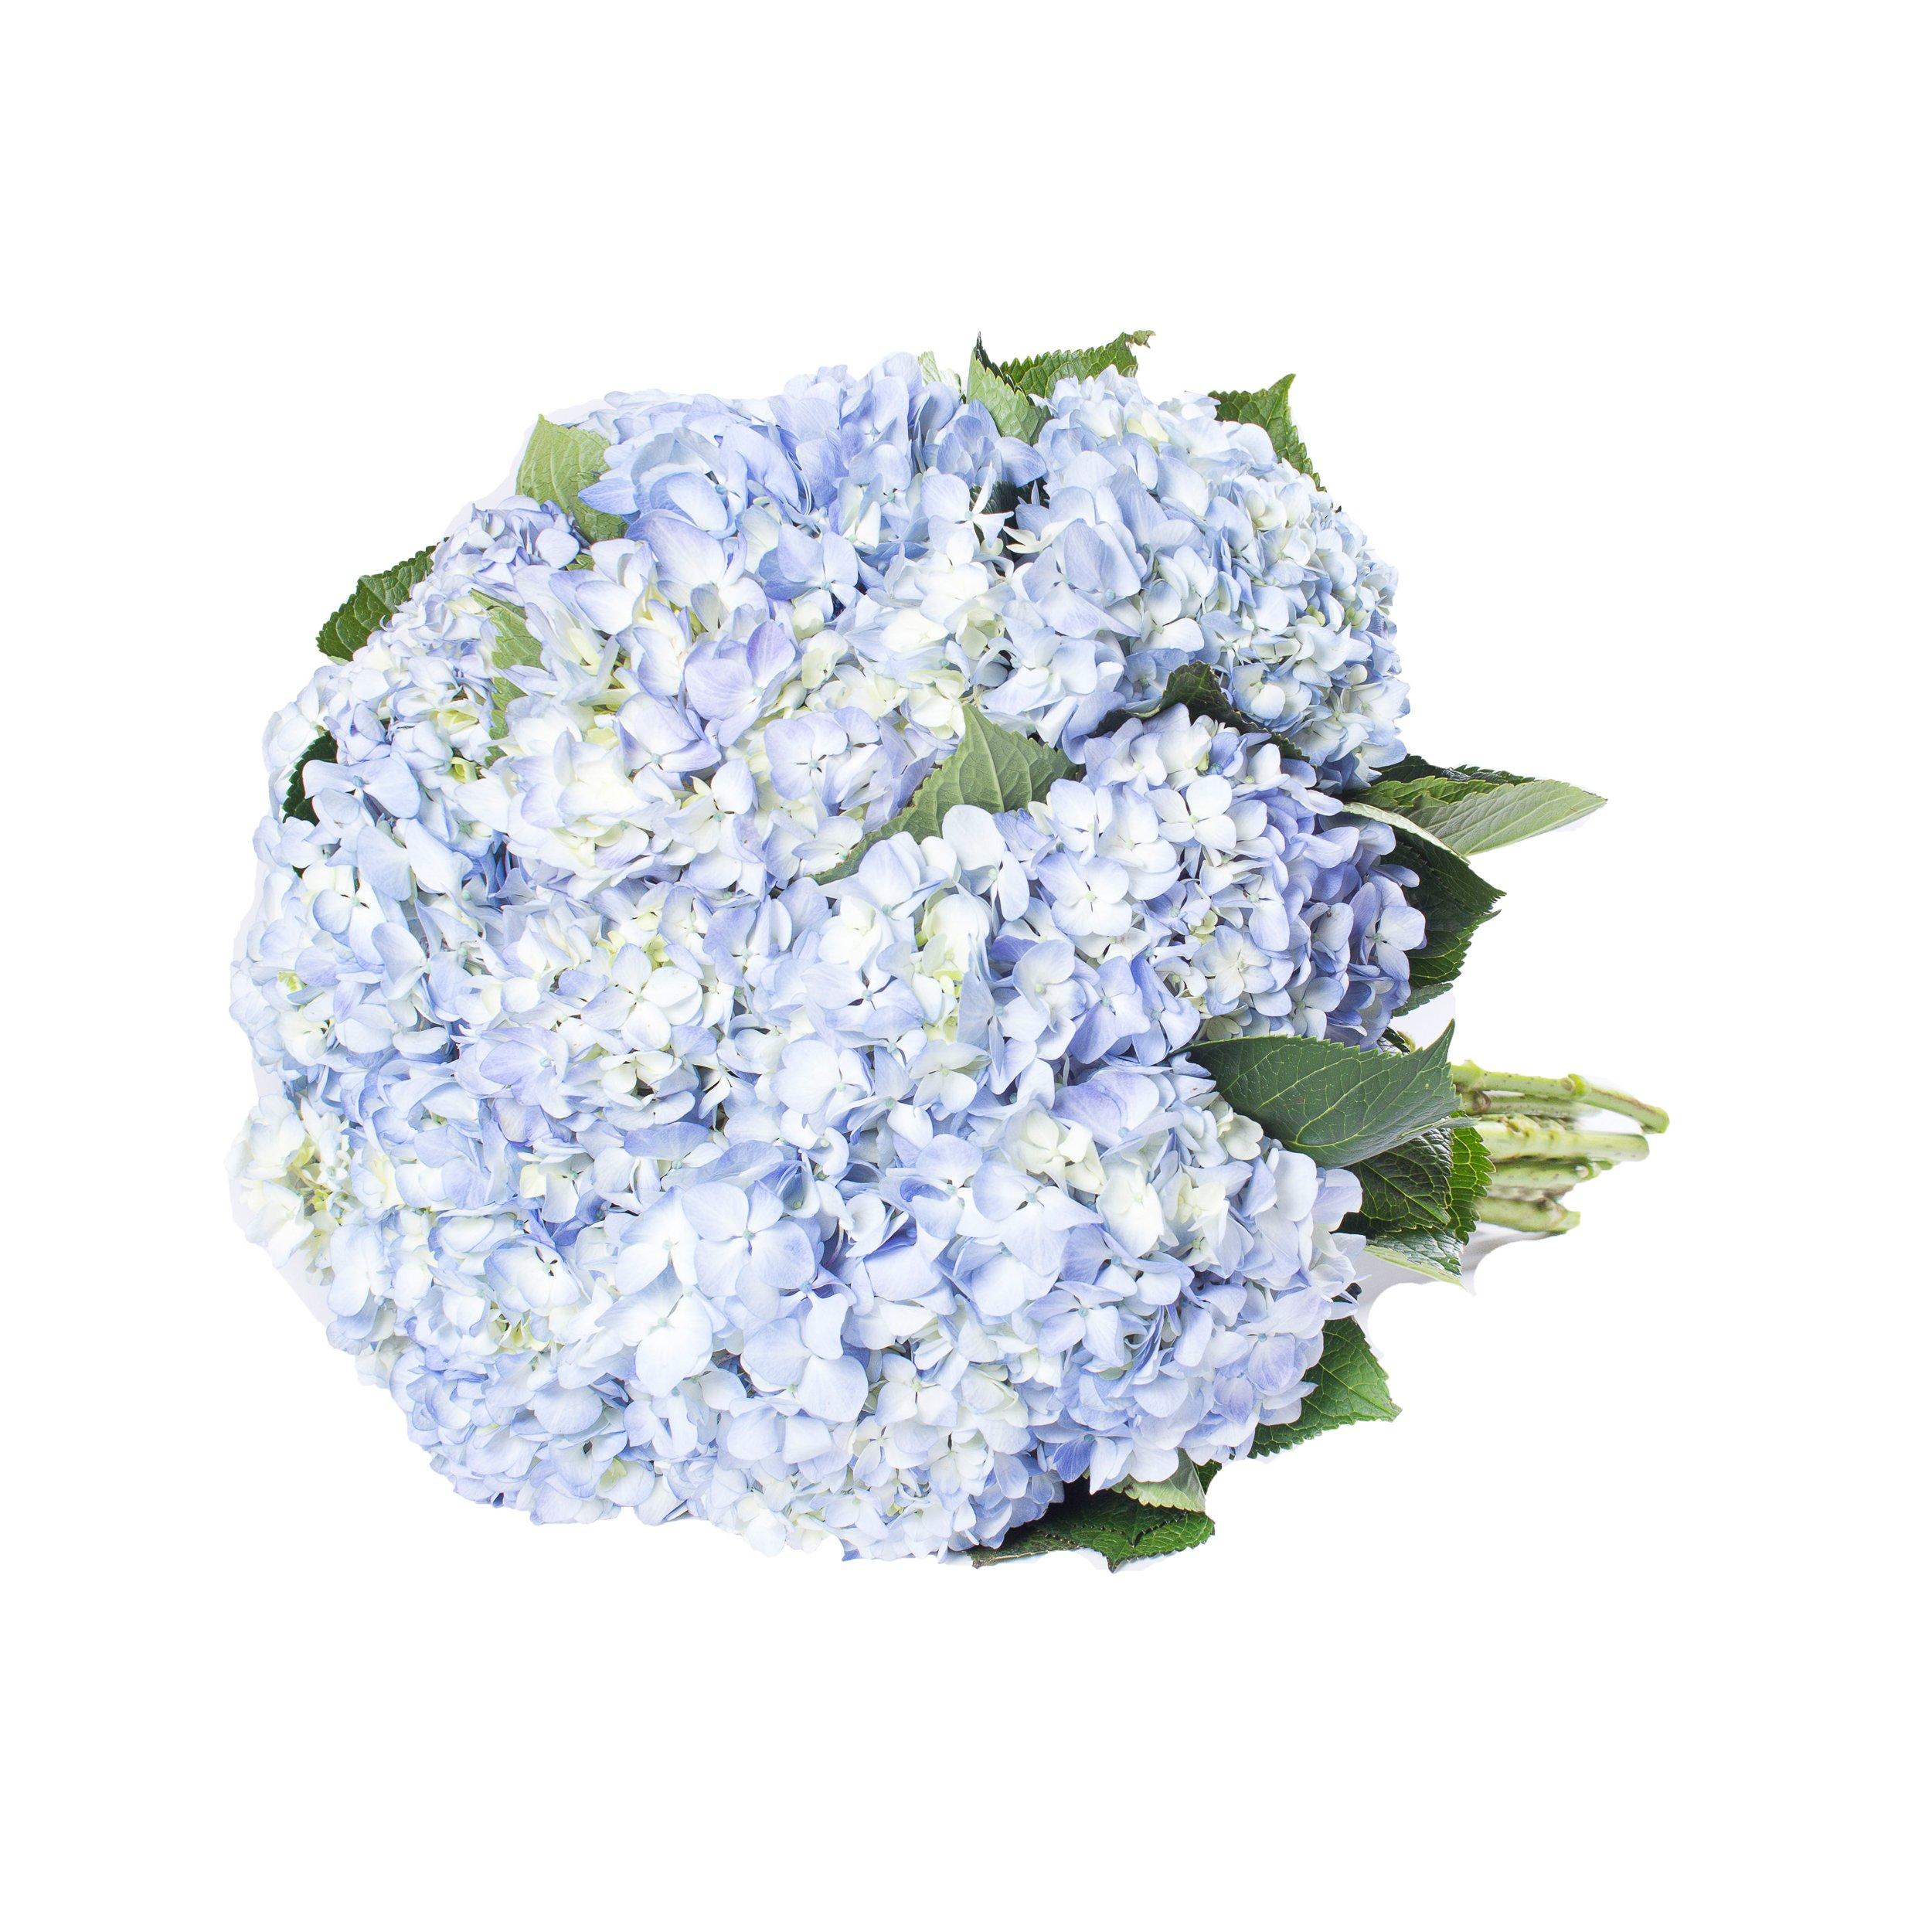 Farm Fresh Natural Blue Hydrangeas- Pack 30 by Bloomingmore